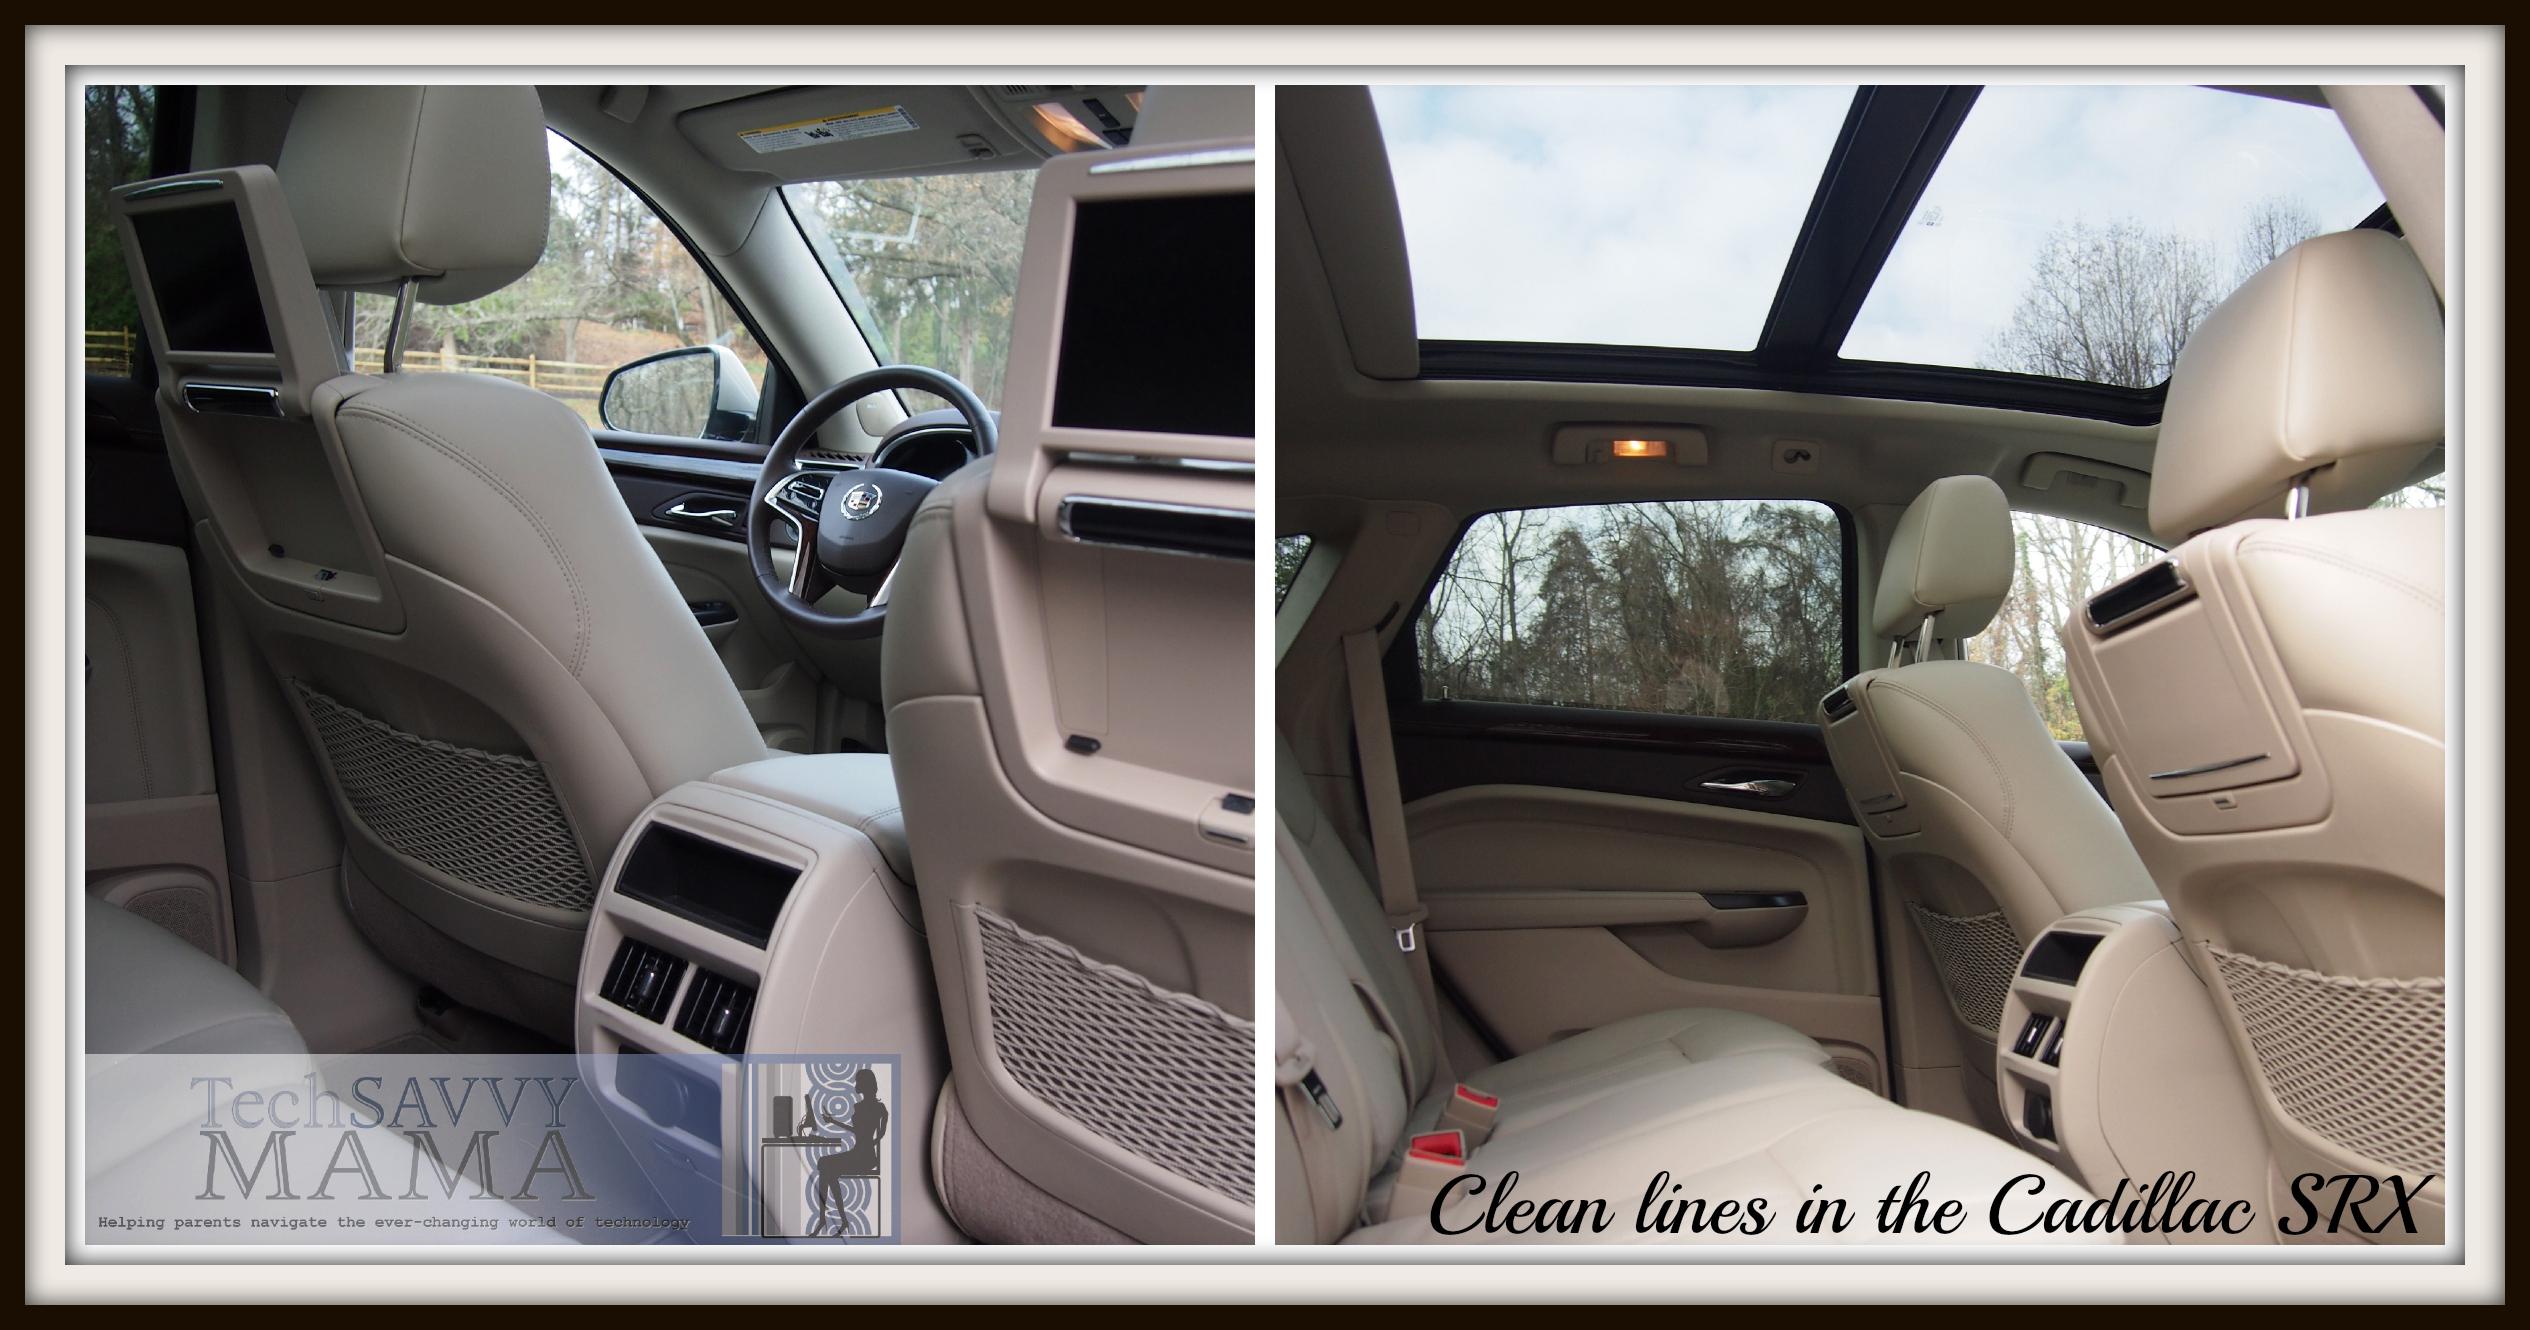 Cadillac-SRX-2013-Rear-Entertainment-System-TechSavvyMama